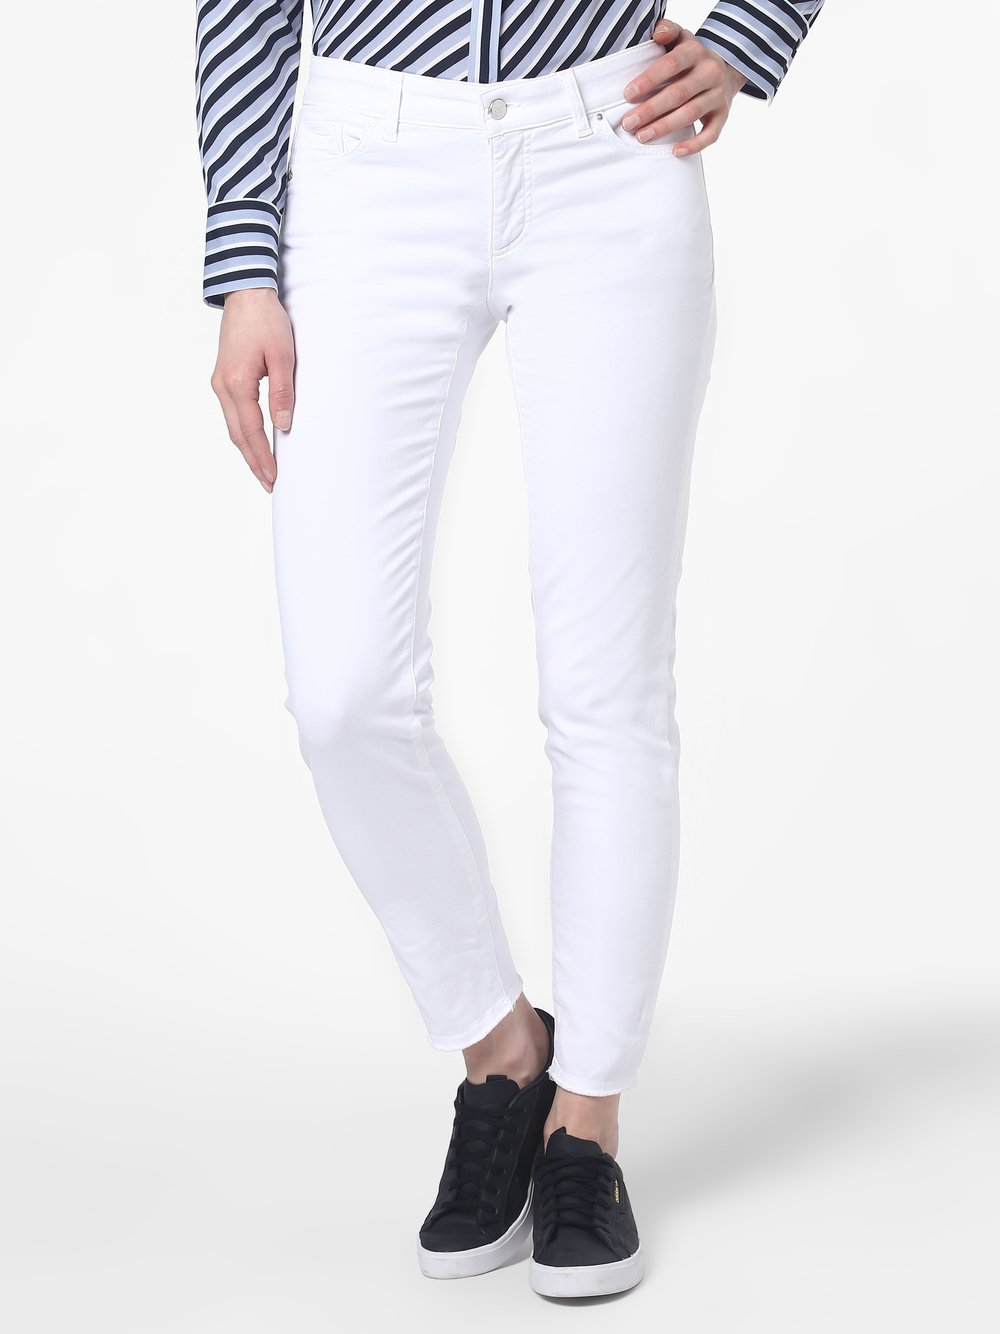 RAFFAELLO ROSSI – Spodnie damskie – Jane Hem, biały Van Graaf 430357-0003-00360